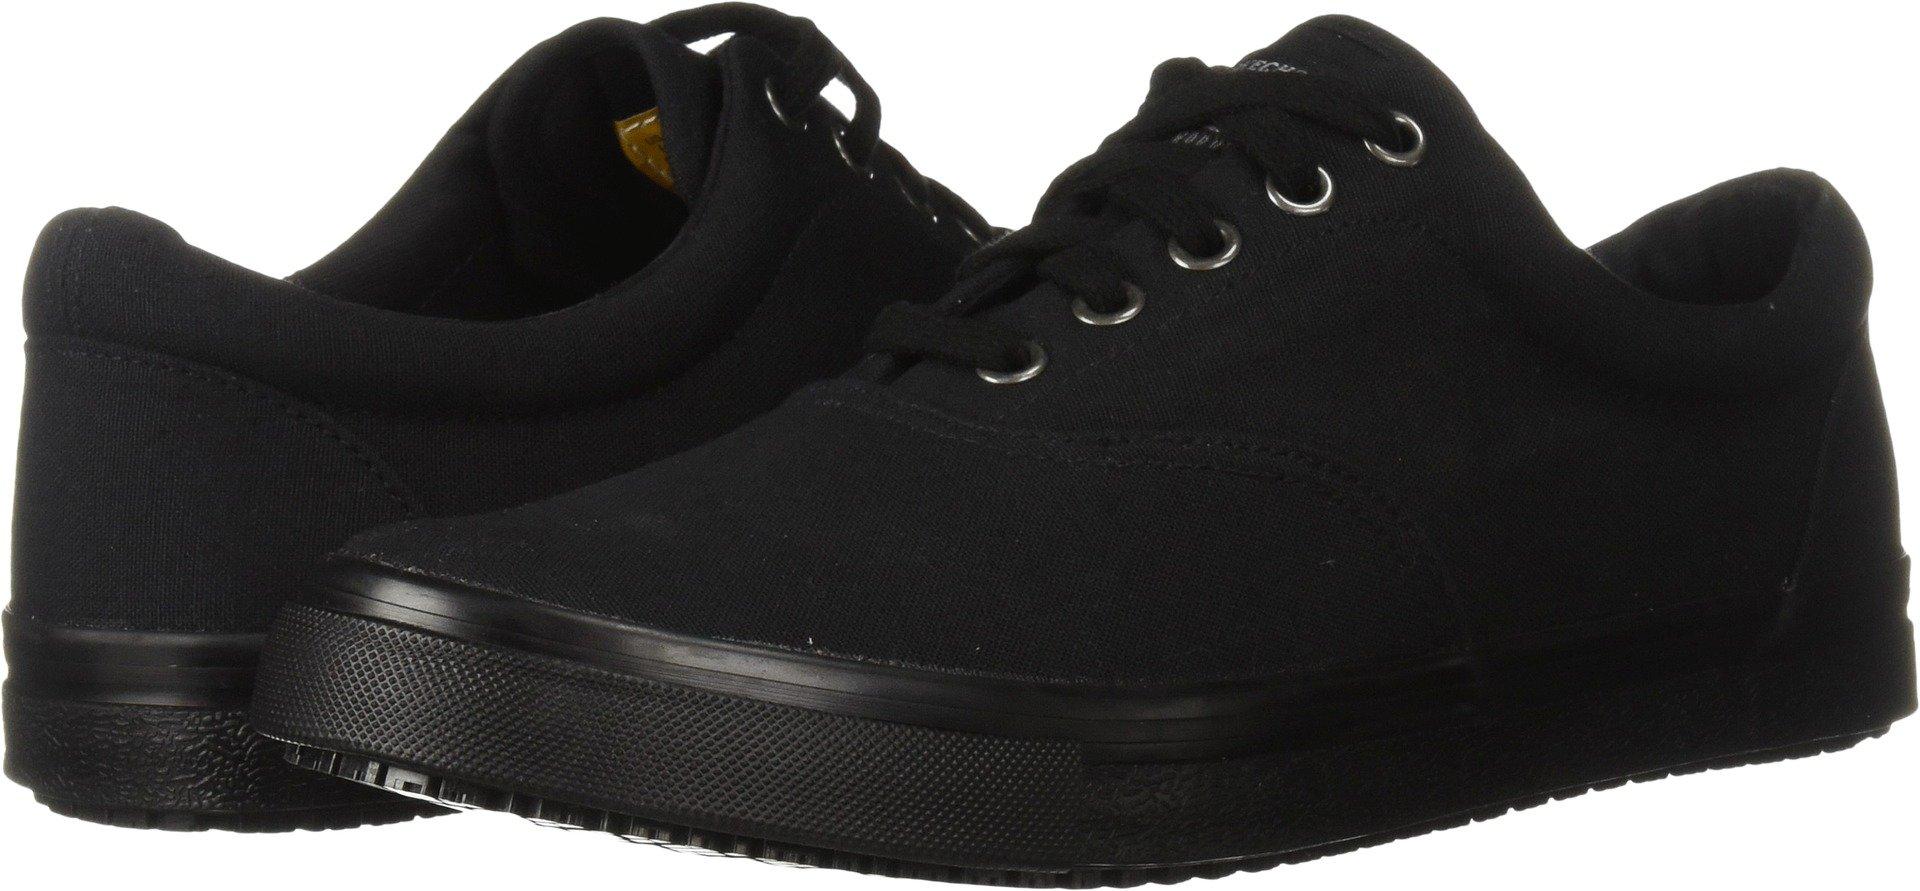 Skechers Work Relaxed Fit Sudler SR Slip Resistant Womens Sneakers Black 7.5 by Skechers